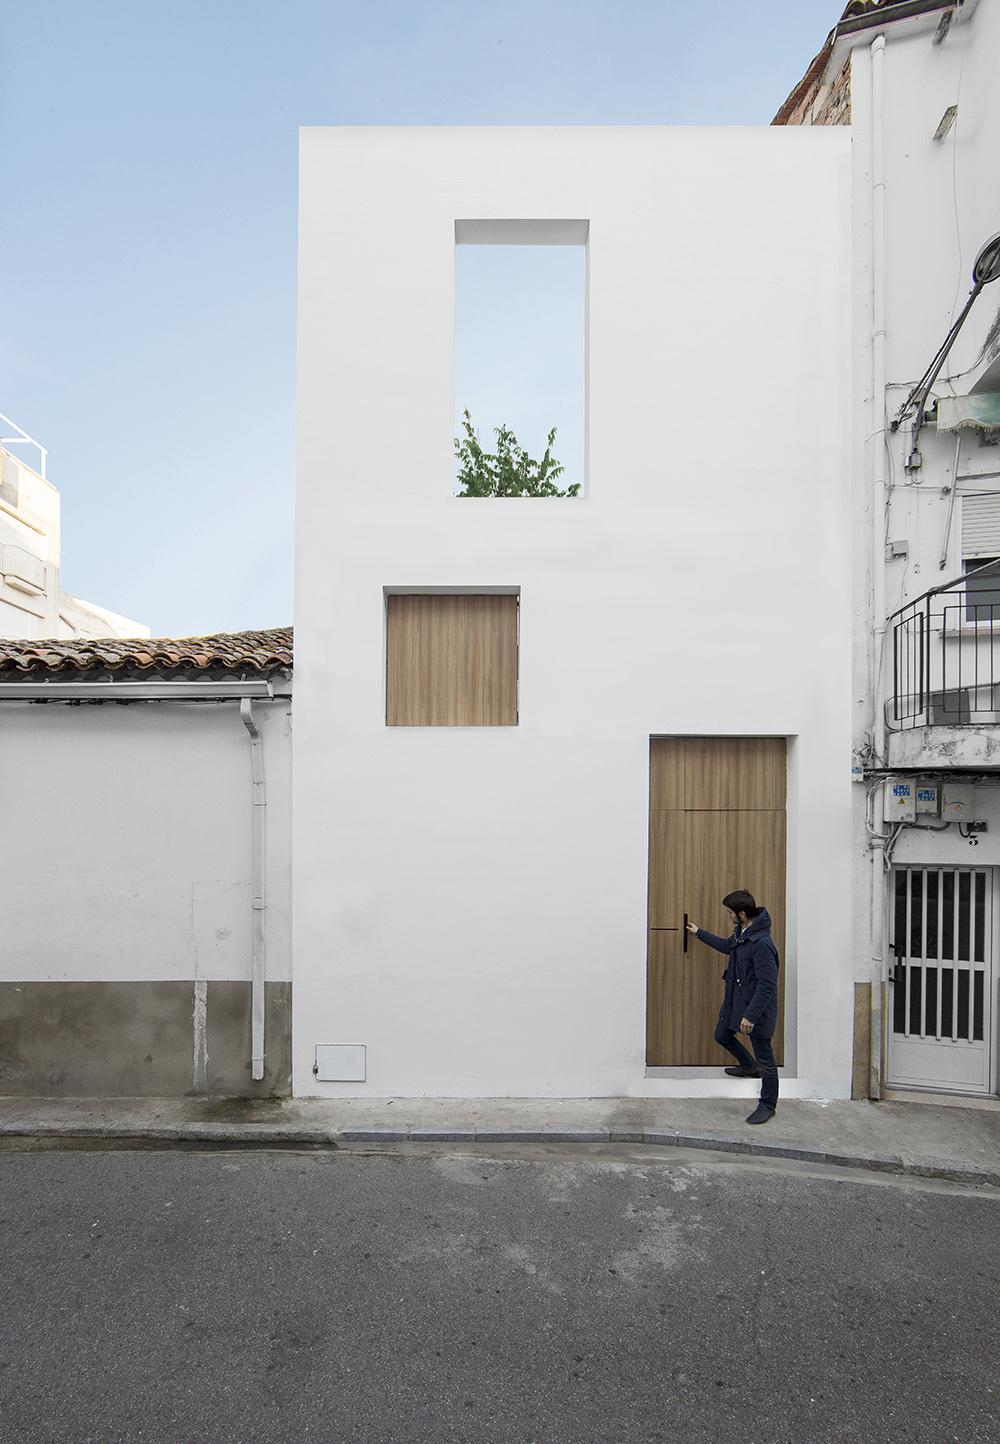 arquitectura moderna Caceres ramiro losada amor alberto garcia 010.jpg